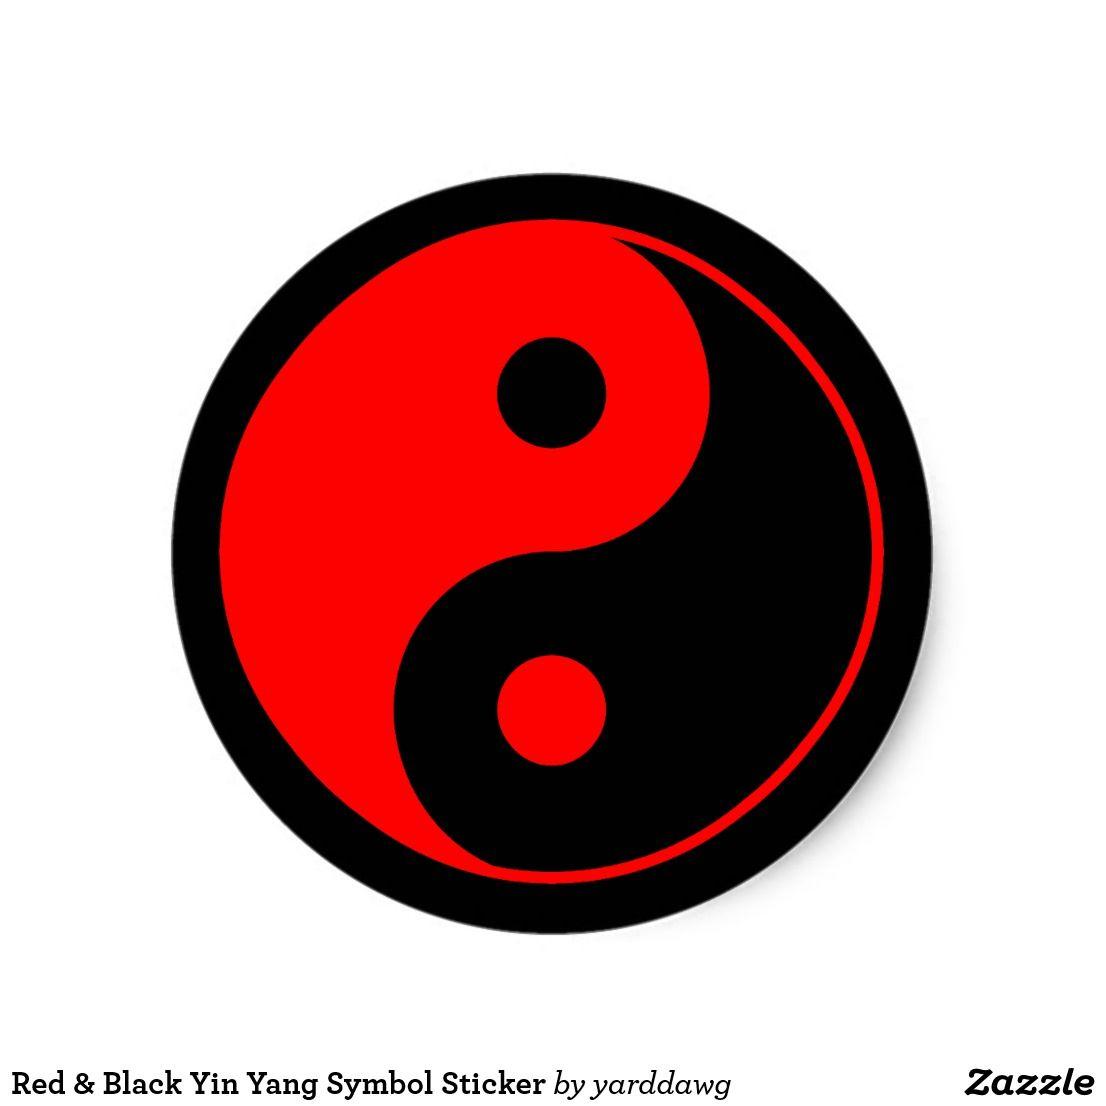 Red Black Yin Yang Symbol Sticker Zazzle Com In 2021 Black And Red Symbols Yin Yang